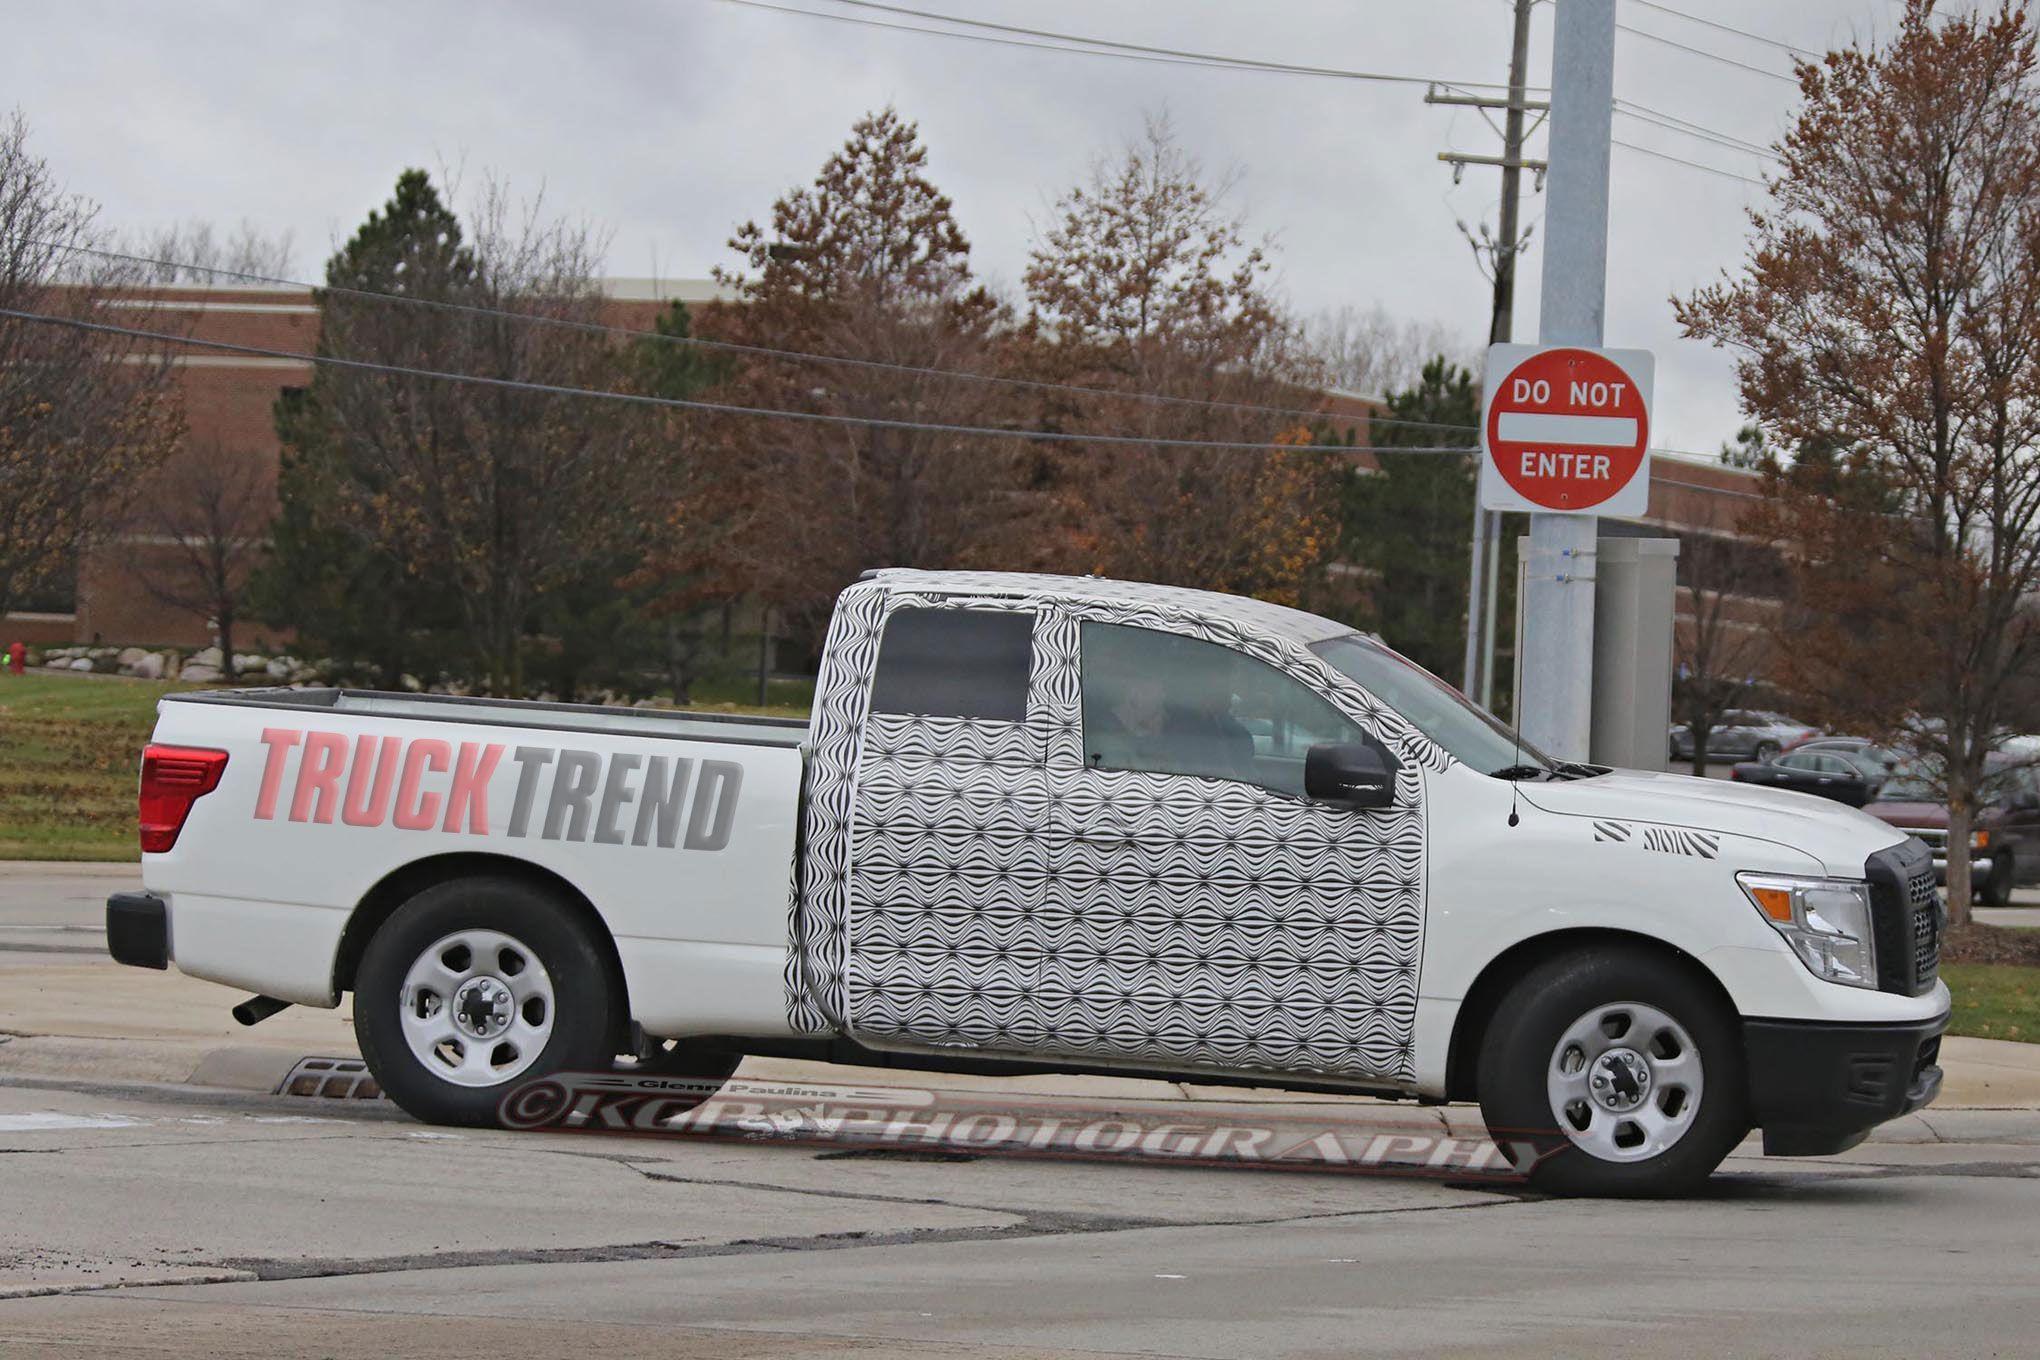 2018 Nissan Titan Extended Cab spy shots